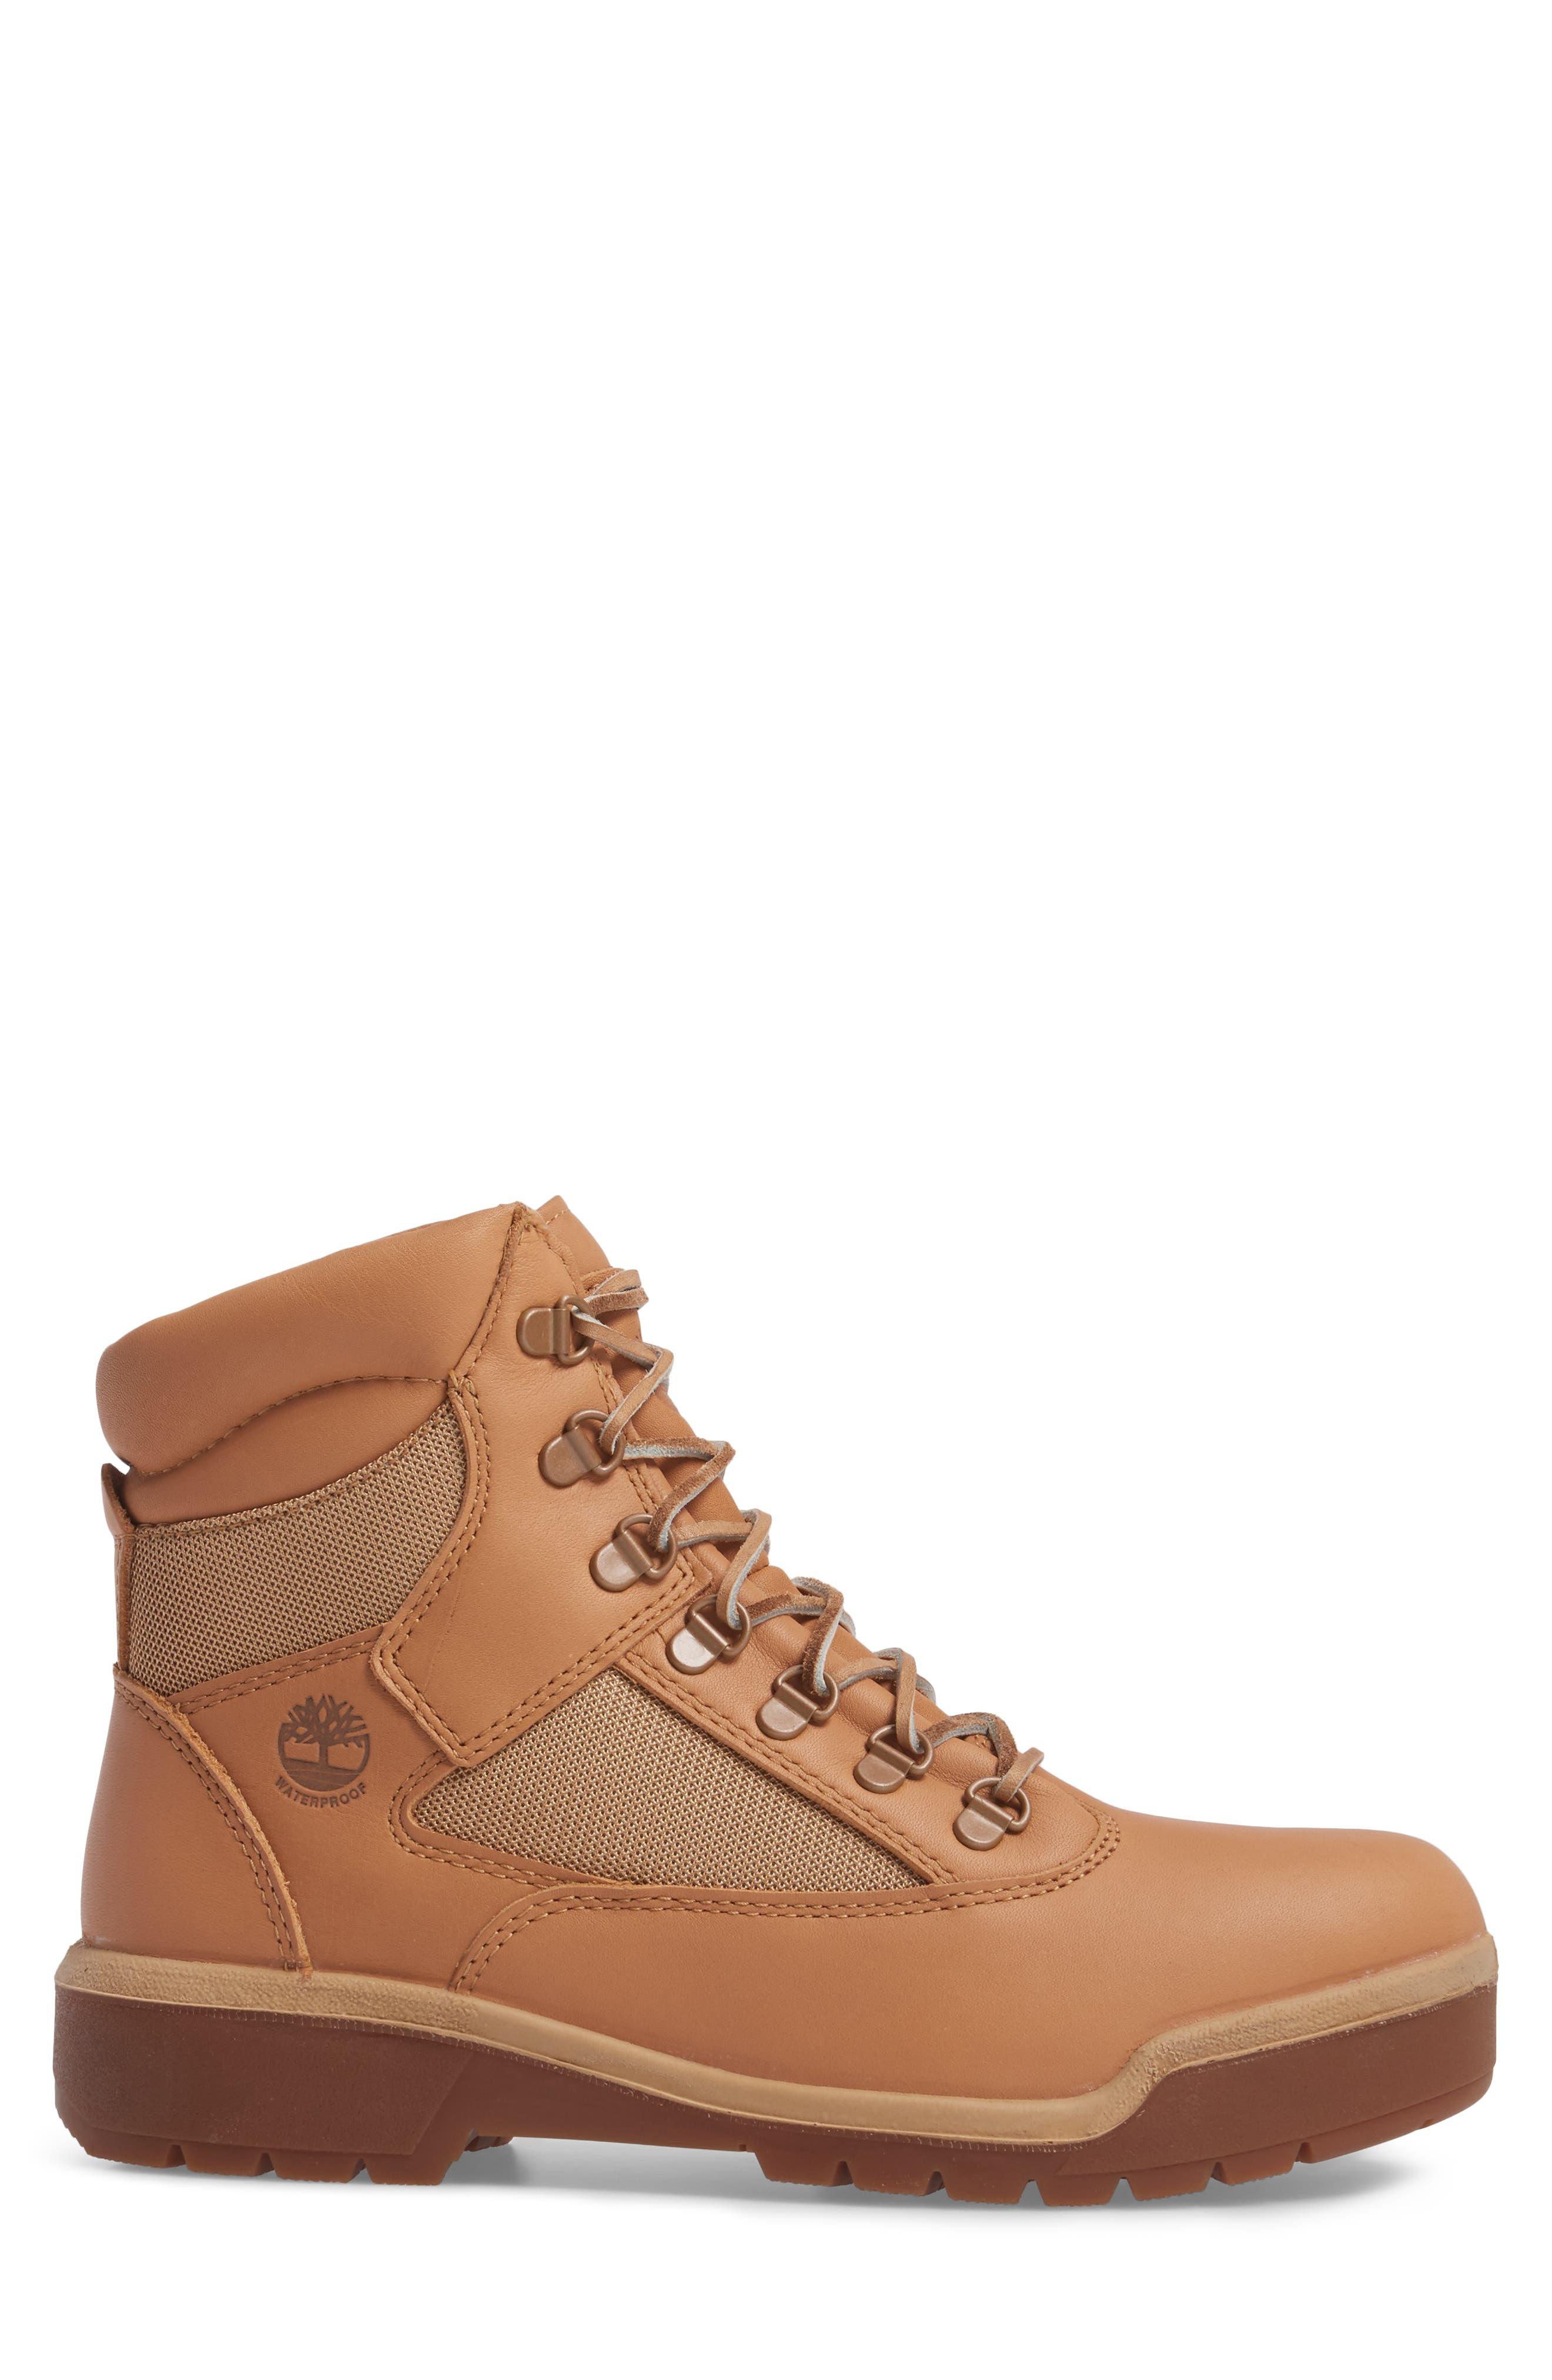 Waterproof Boot,                             Alternate thumbnail 3, color,                             Natural Hoween/ Latigo Leather